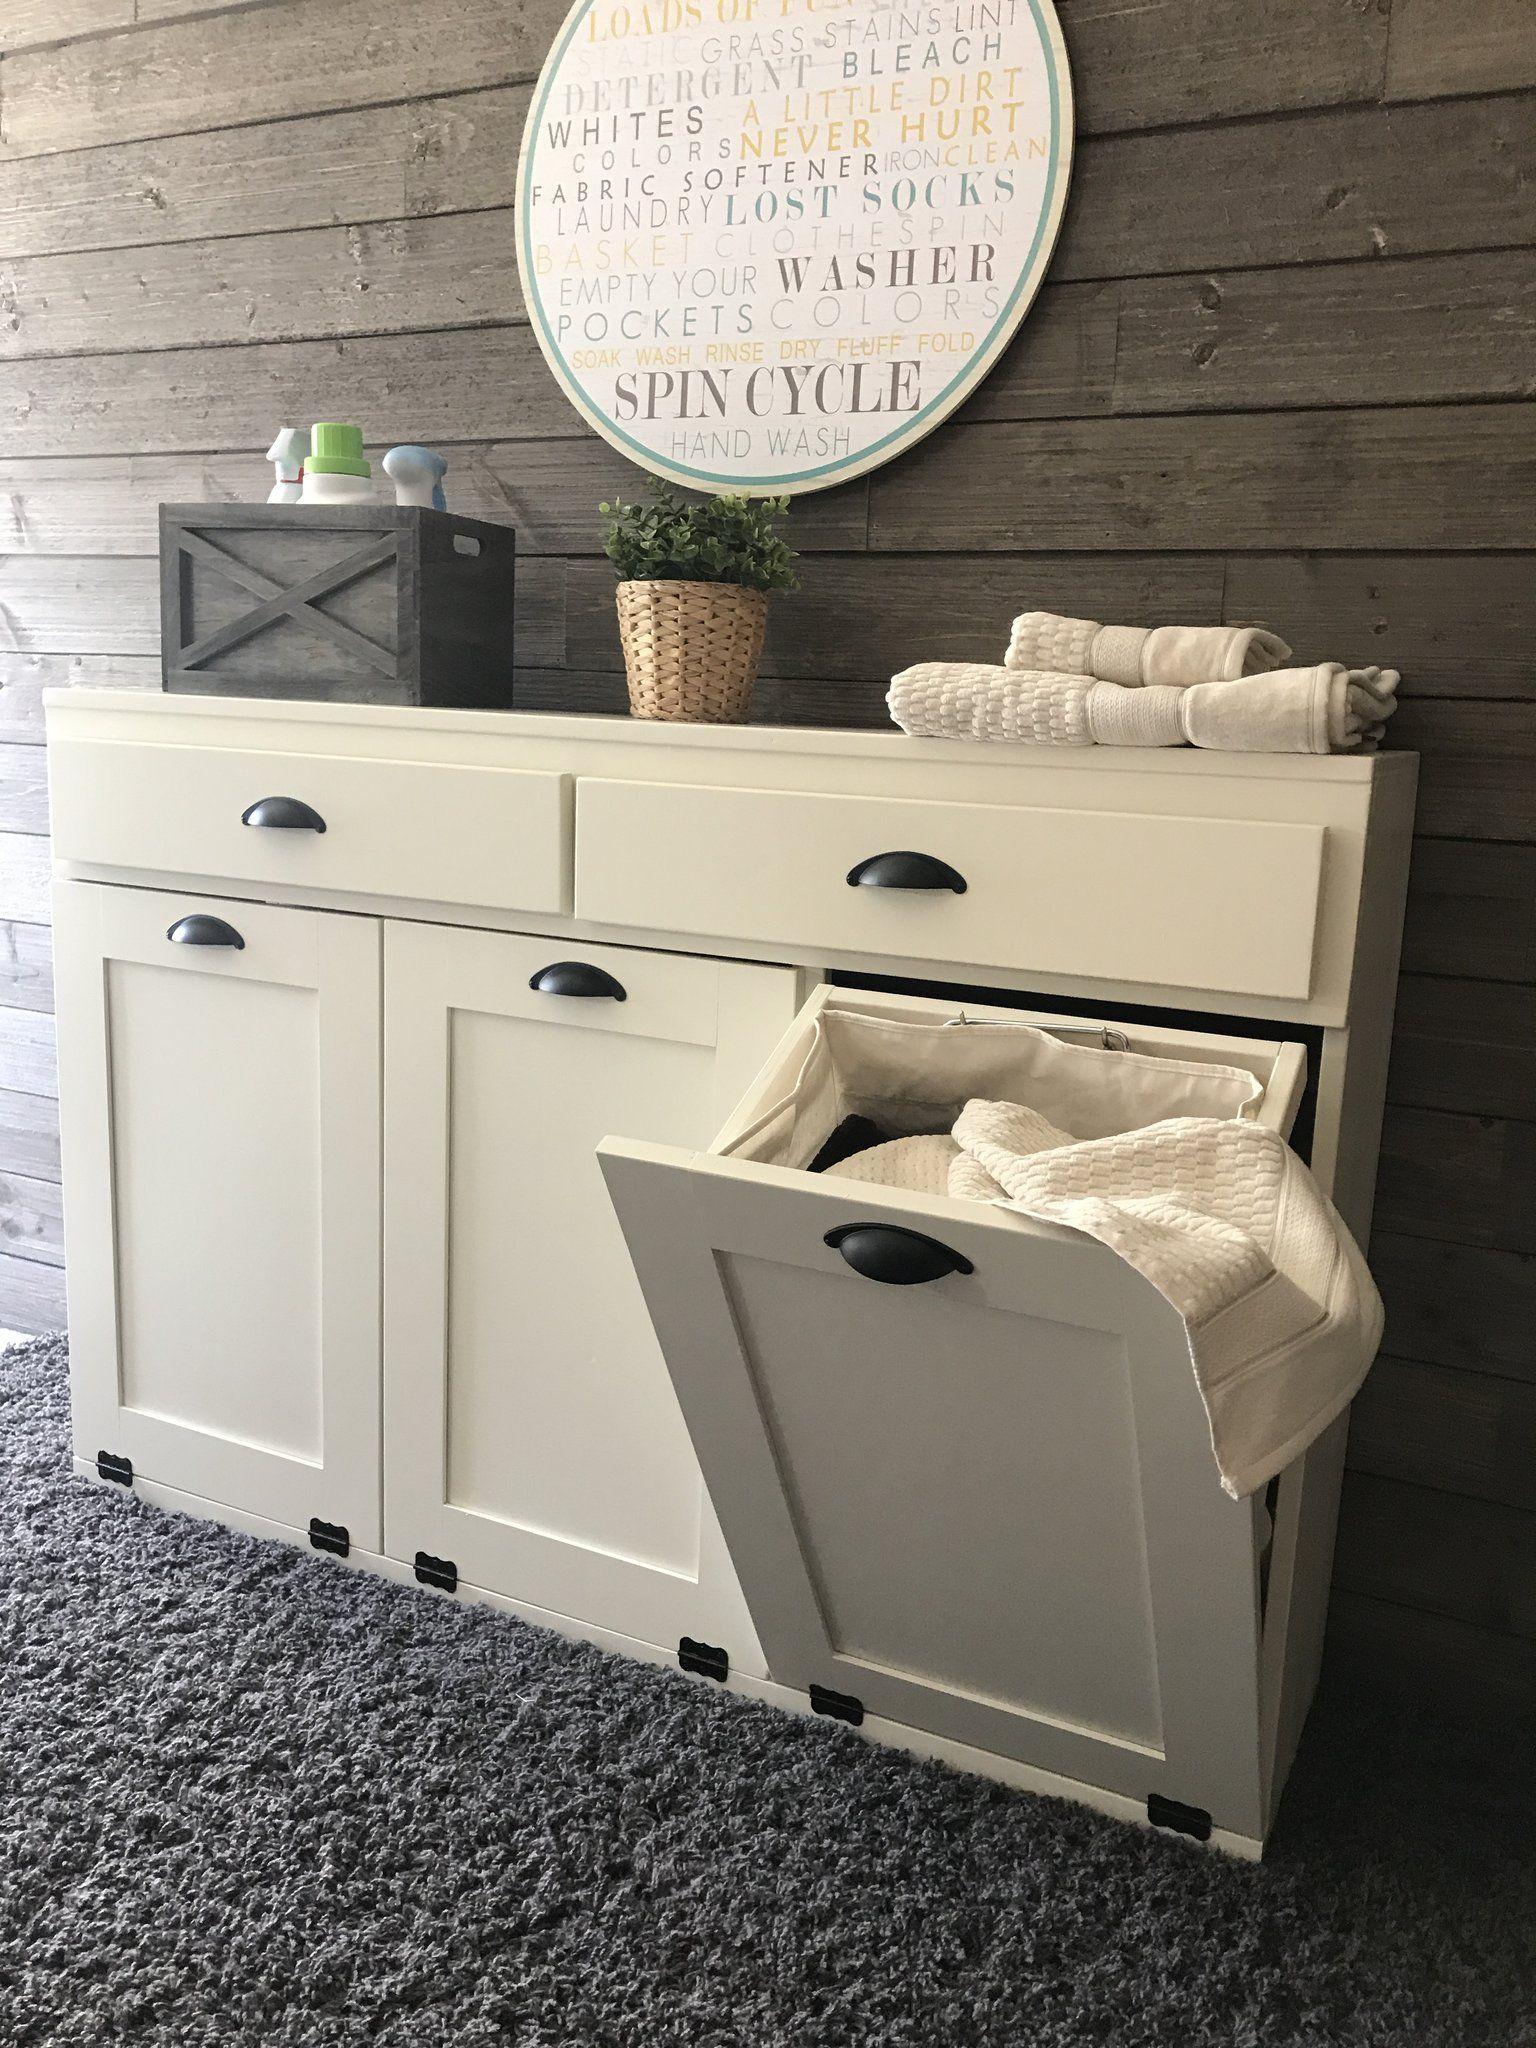 triple laundry hamper with storage drawers (3REG-LAU-DRAW-multi)